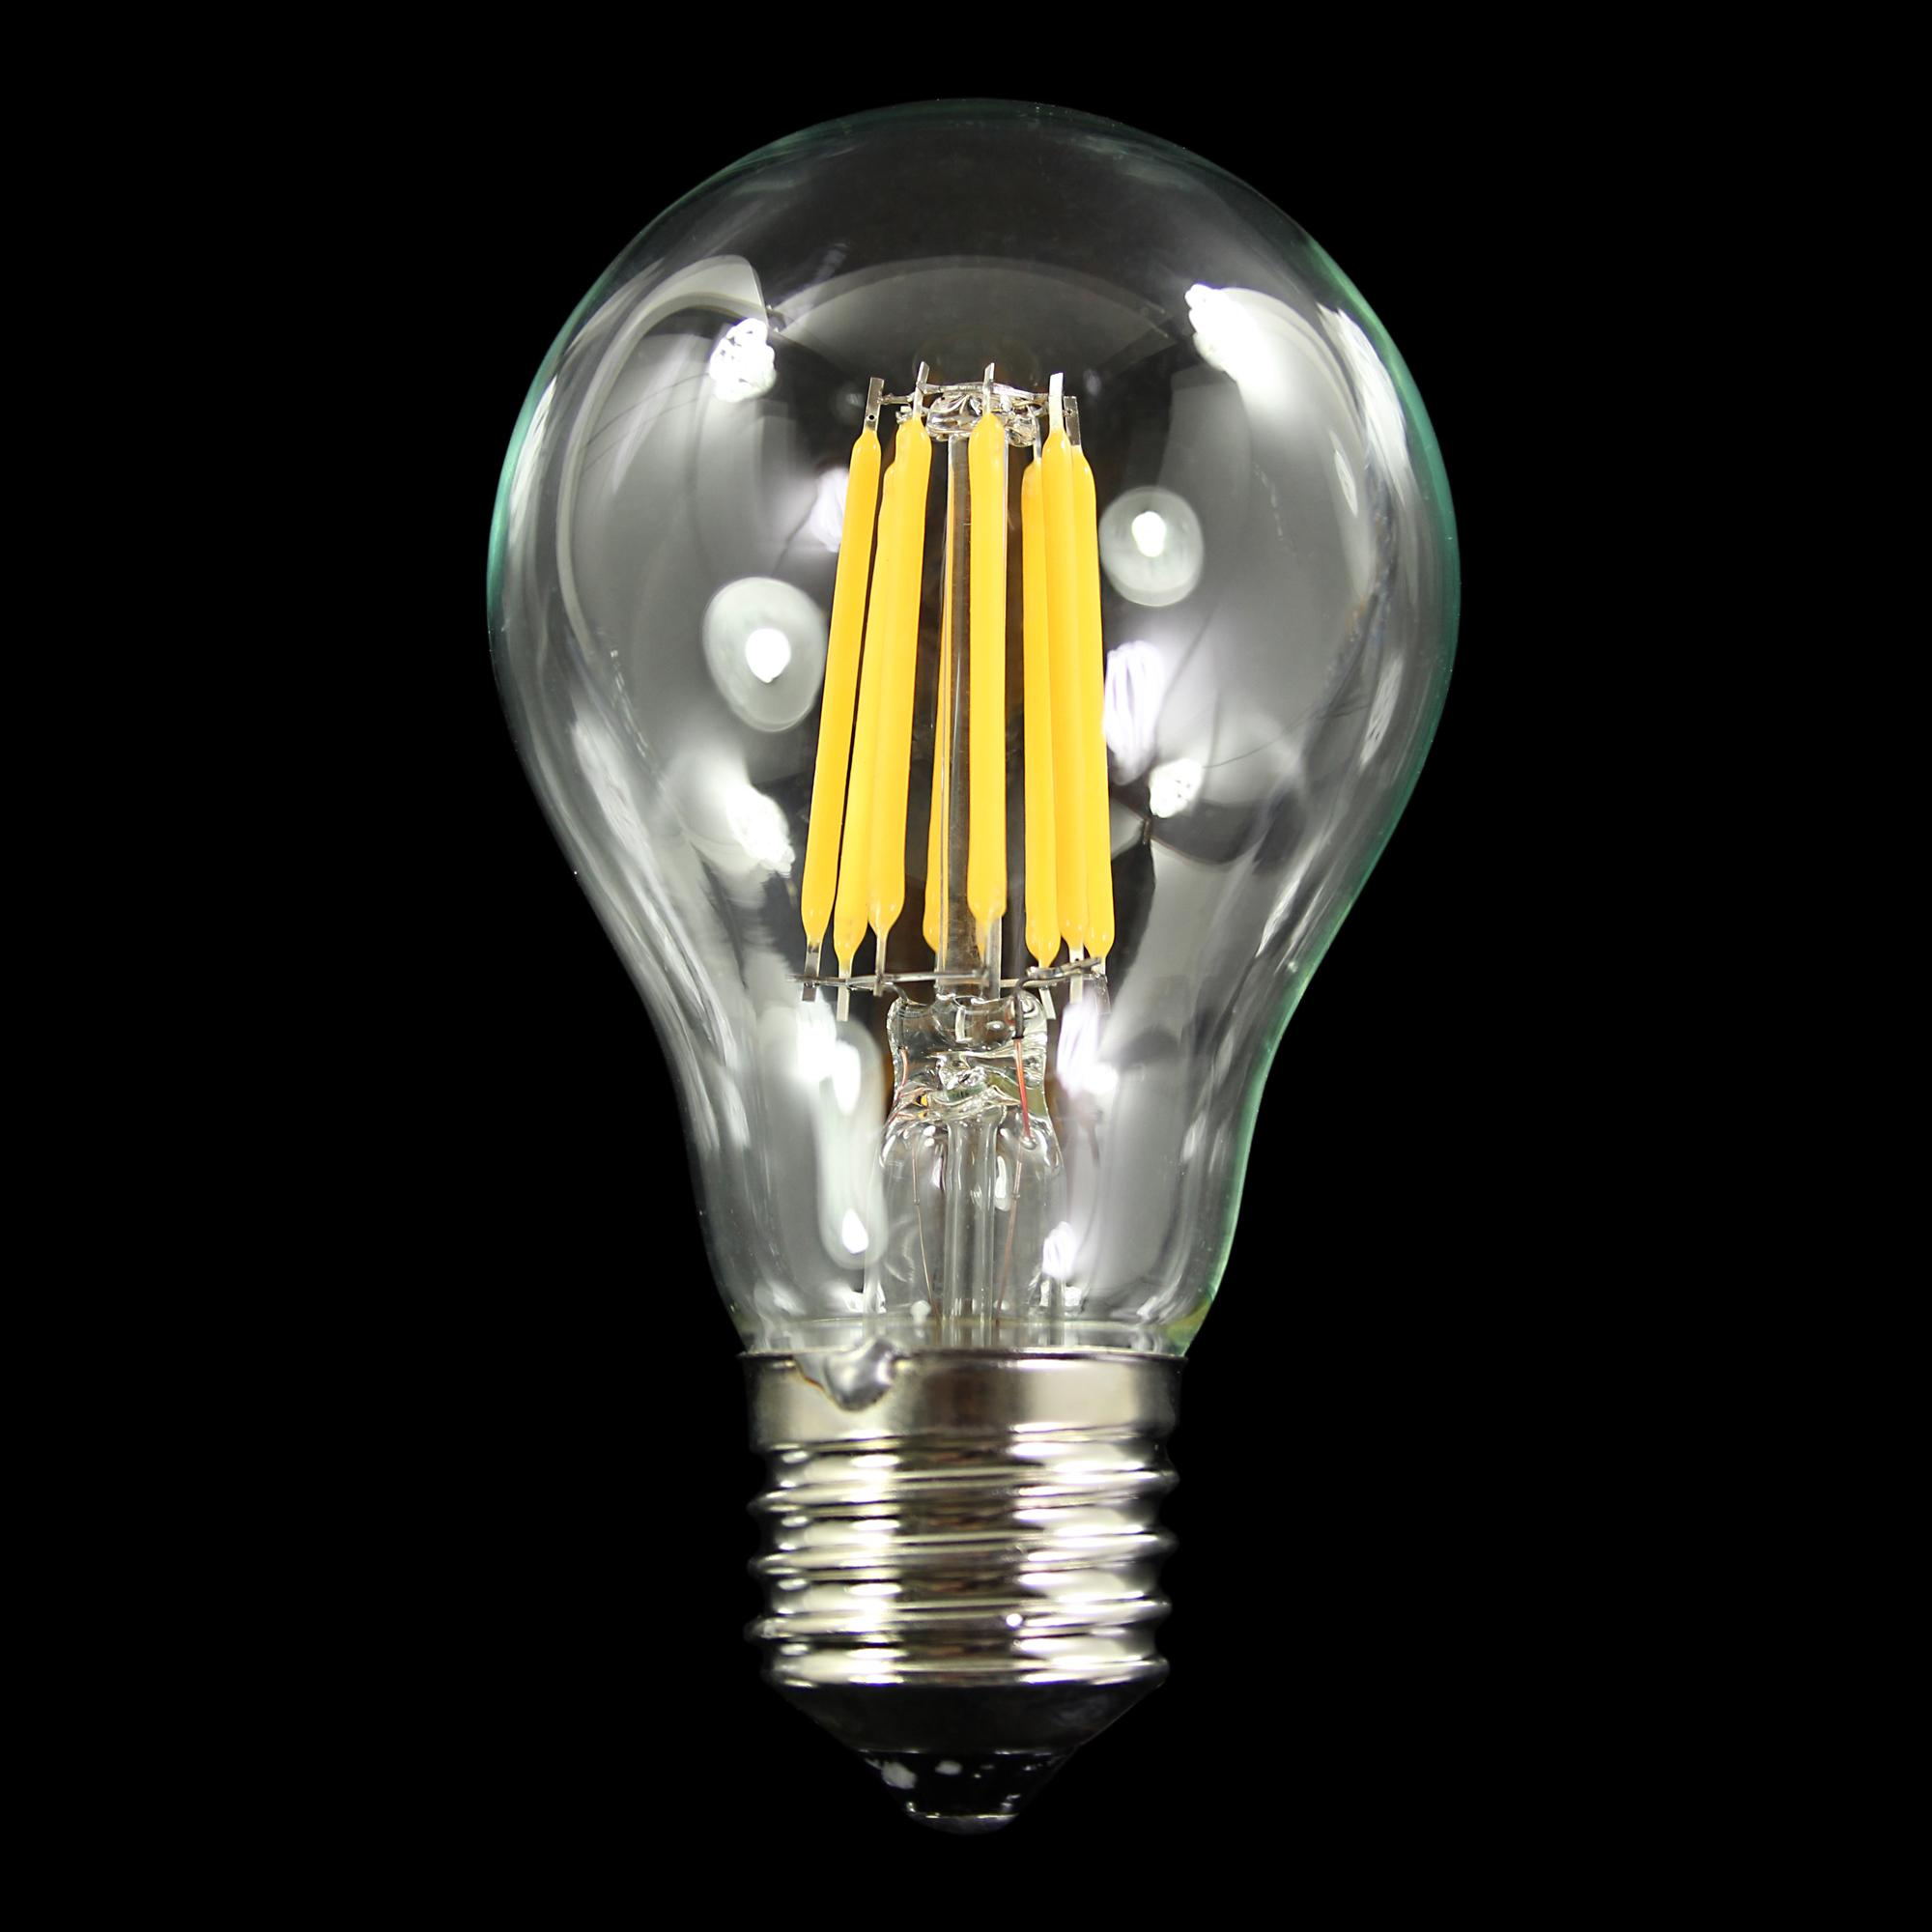 Lampadina con  strisce Led COB lineari, attacco E27, 8W 230V, luce naturale 4000K.